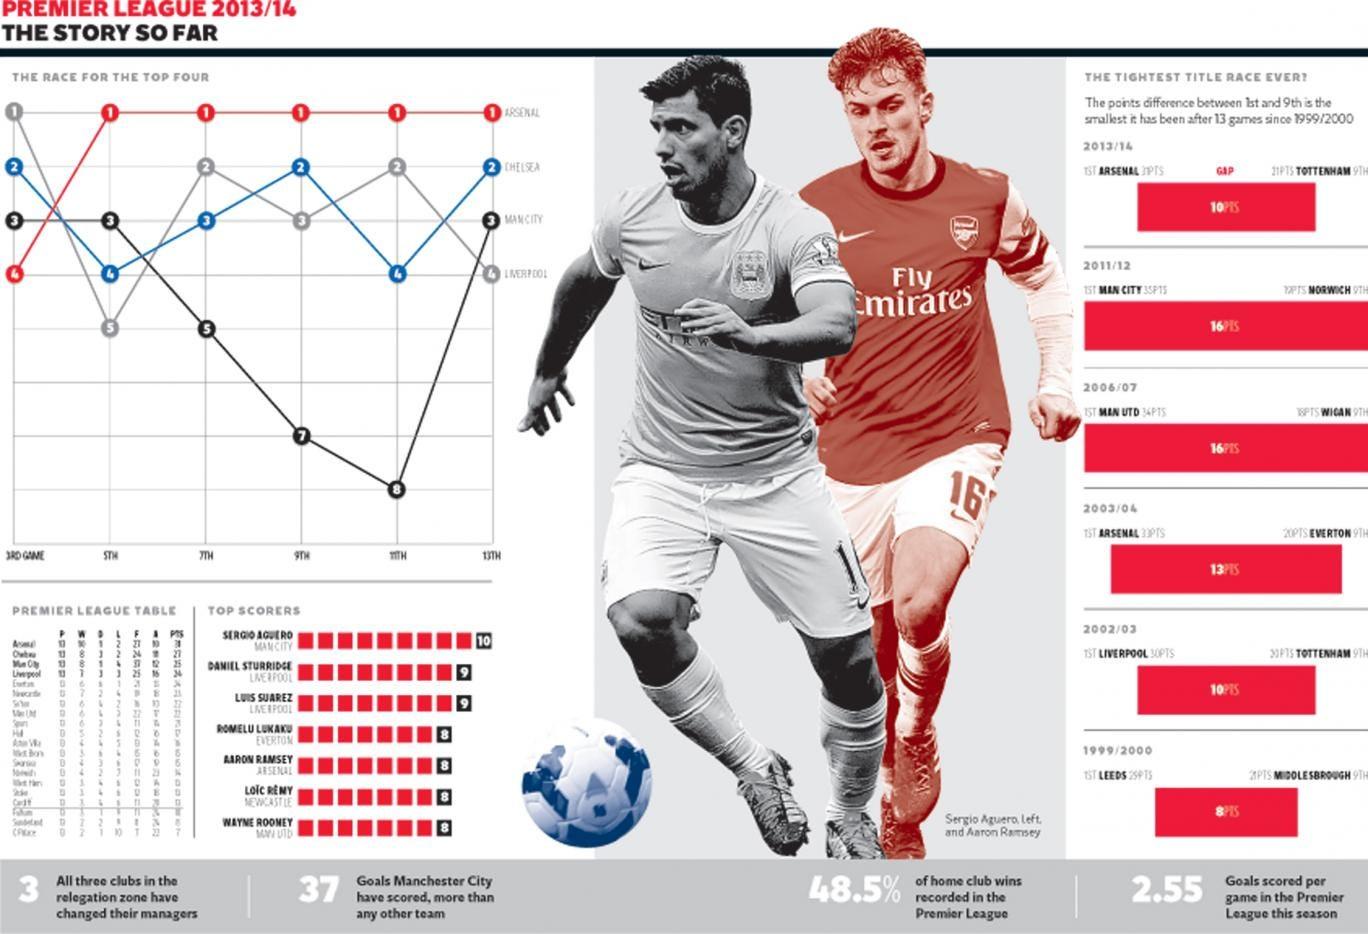 Premier League 2013/14: The story so far - The race for the top four